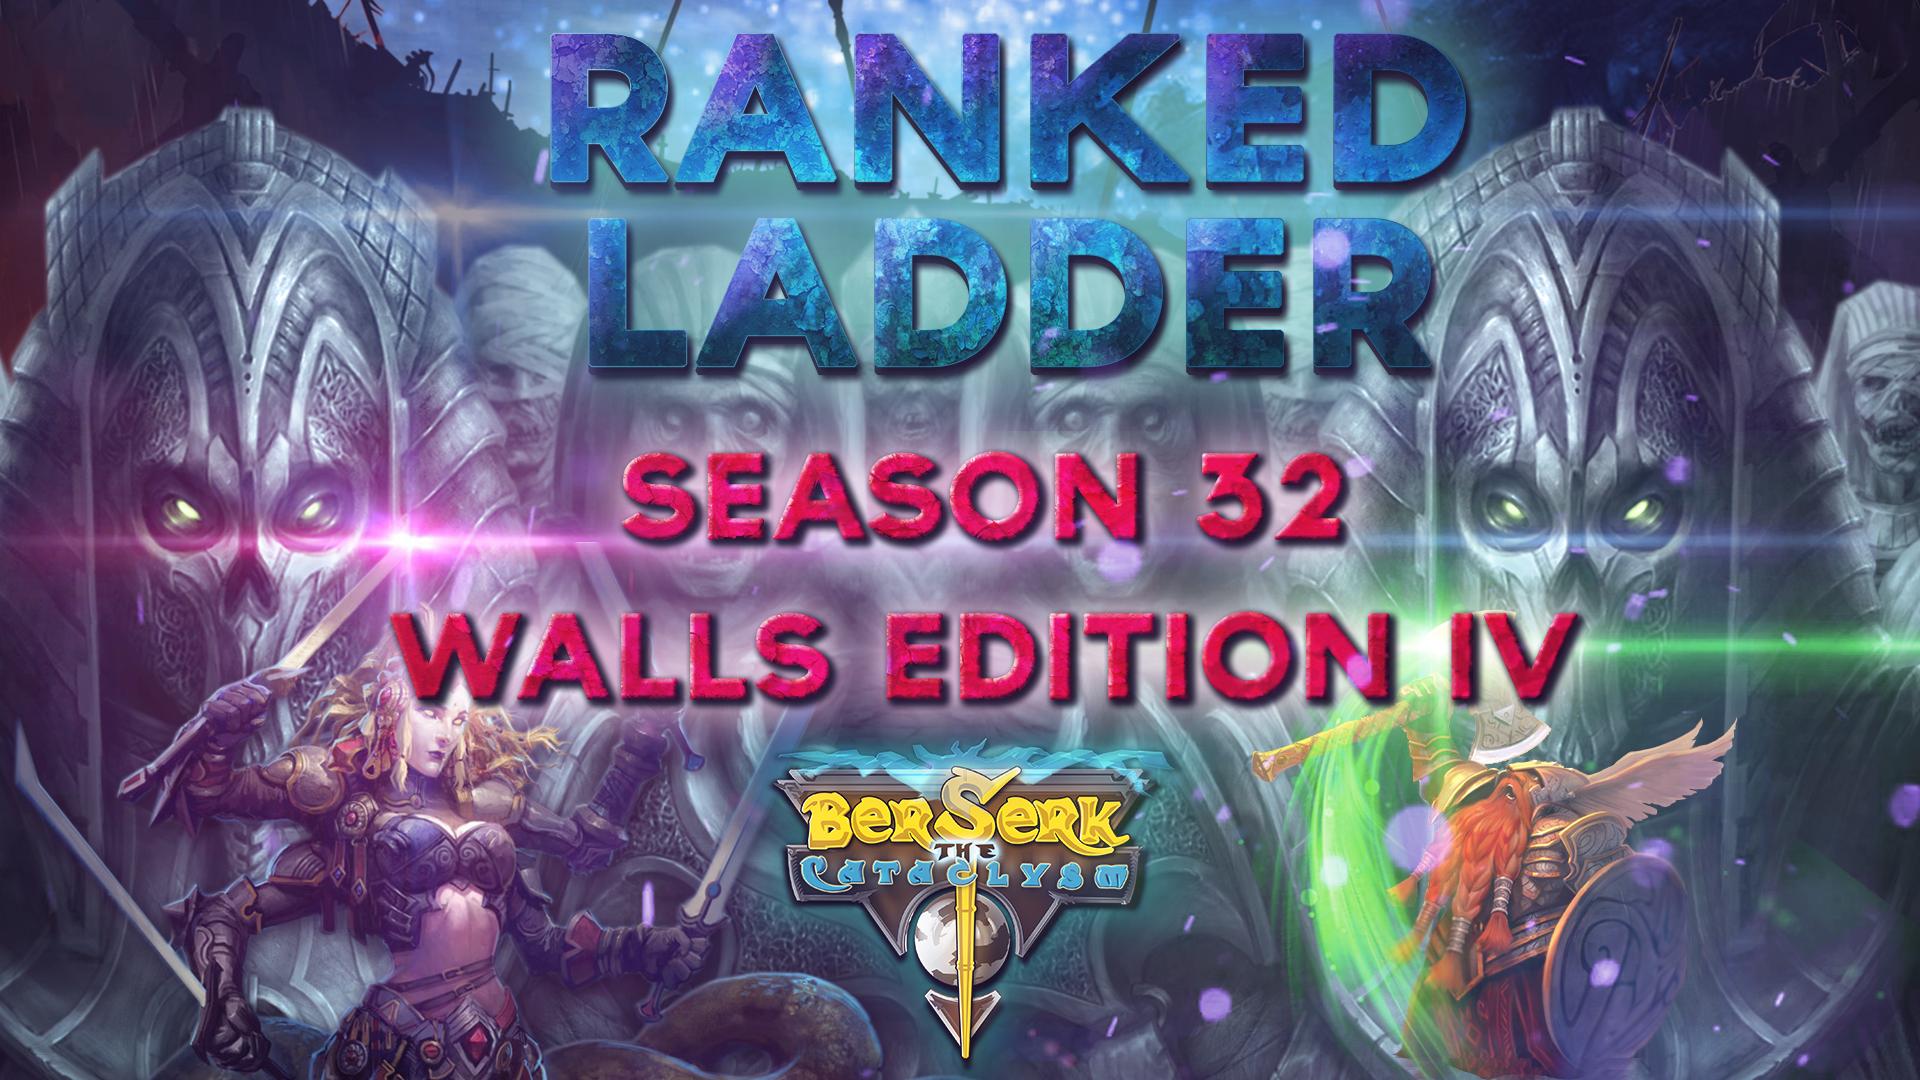 Ranked_LAdder_Season_32.jpg